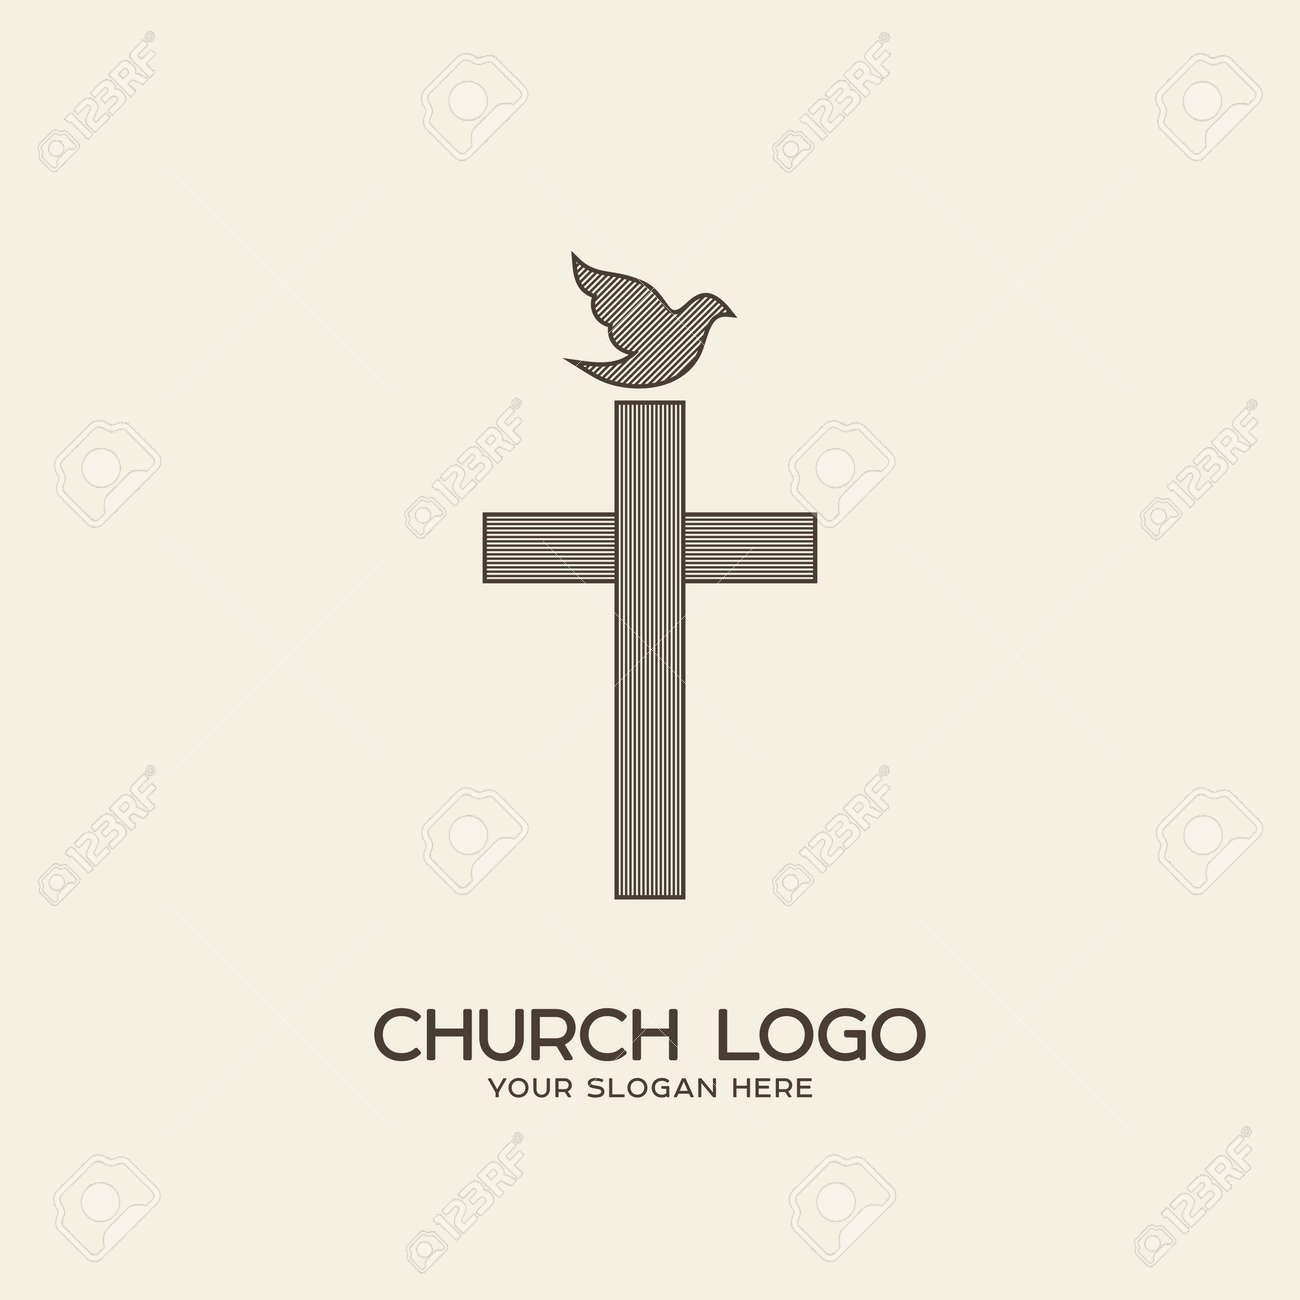 Church logo christian symbols the cross of jesus and the dove christian symbols the cross of jesus and the dove stock vector buycottarizona